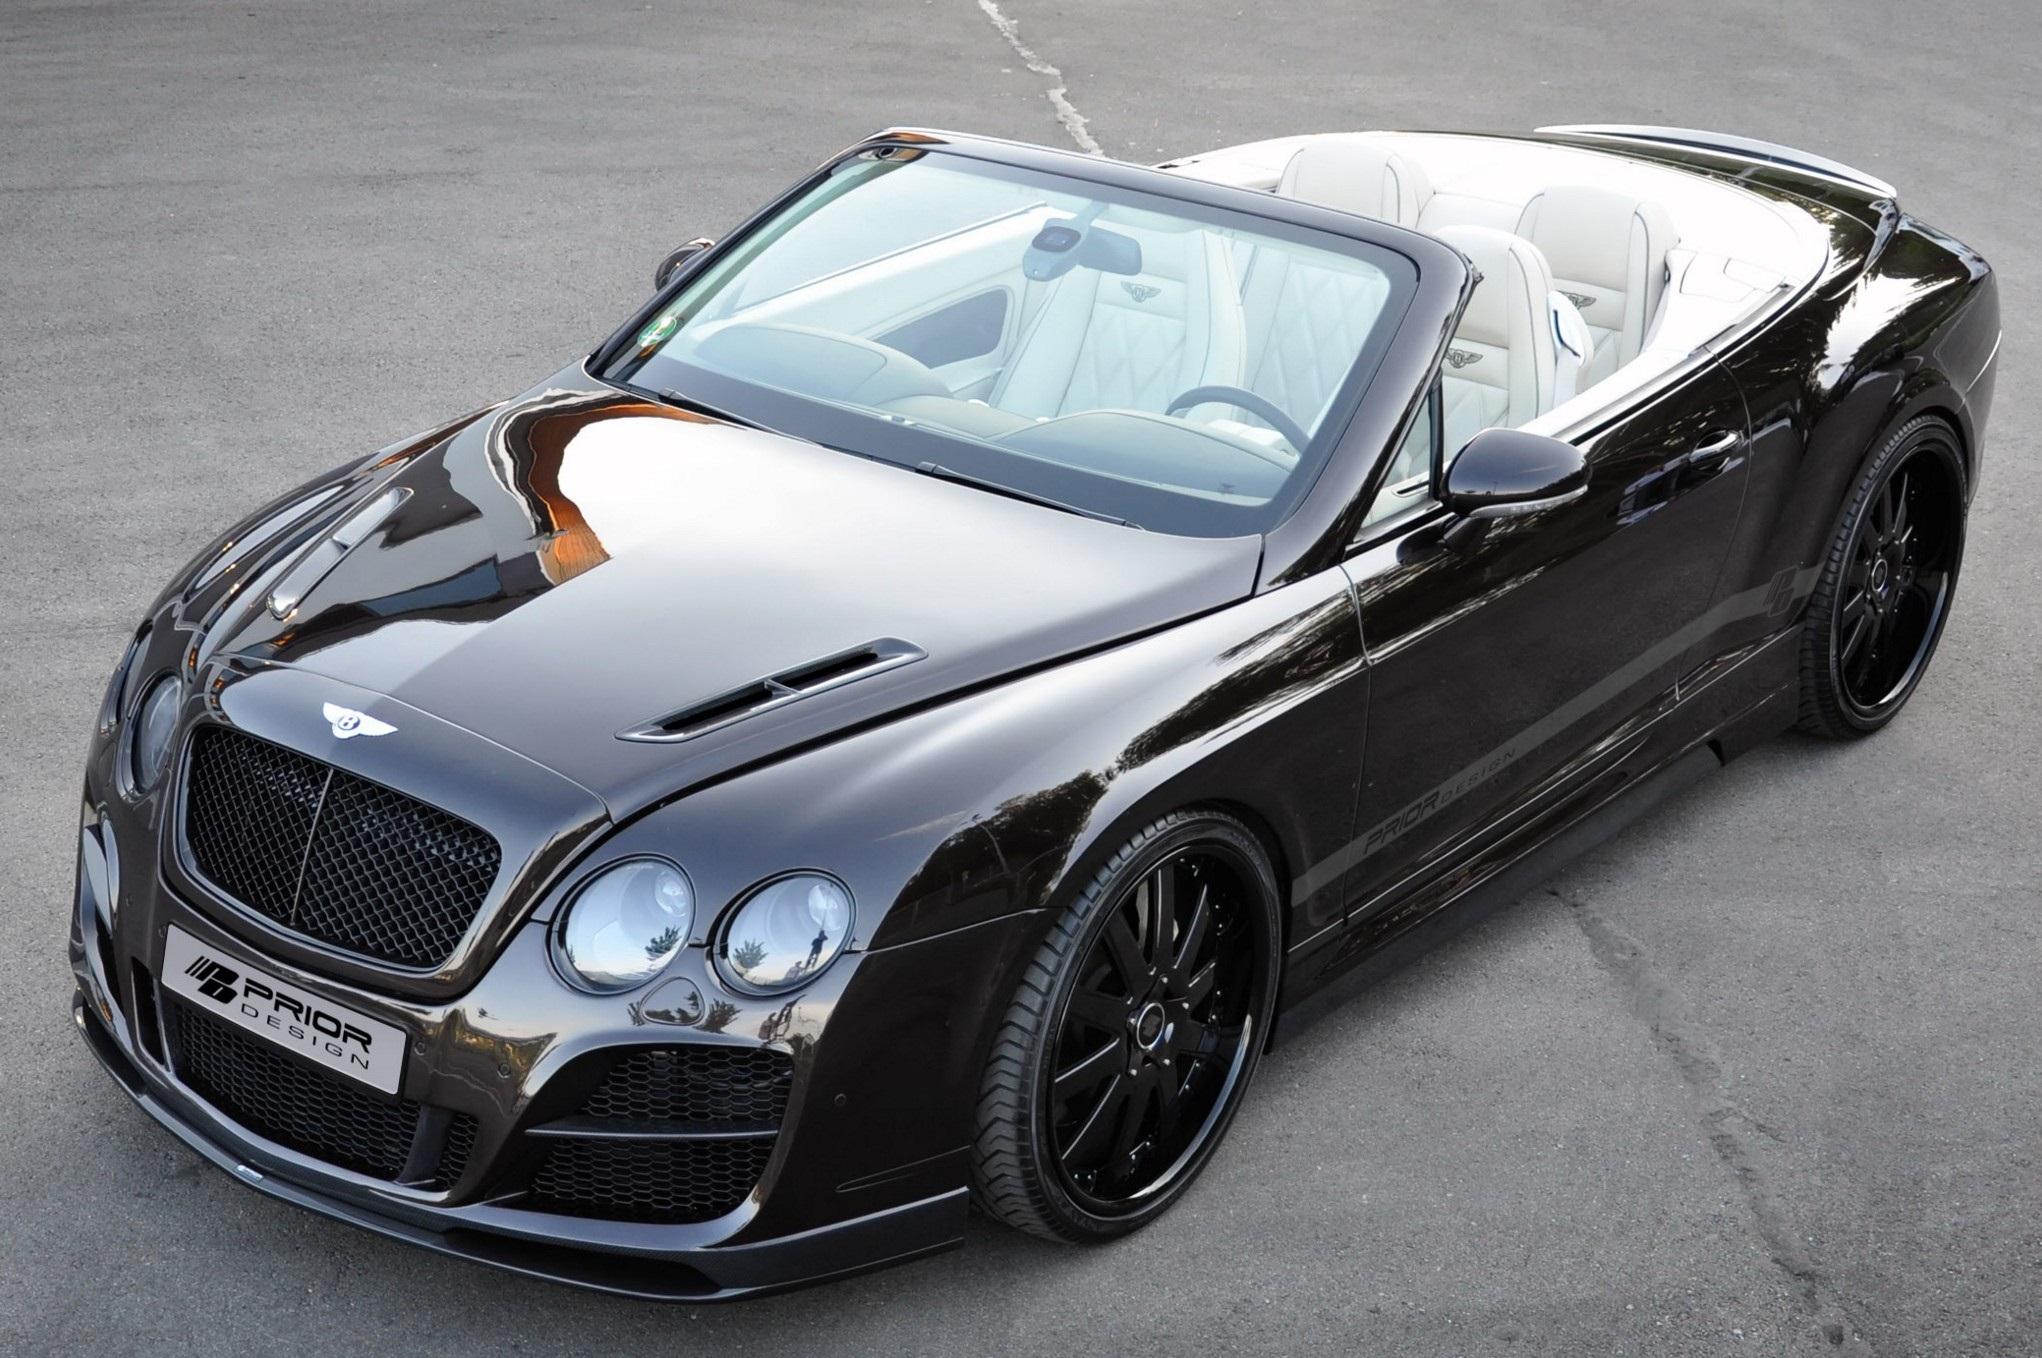 Bentley Continental Gt Full Hd